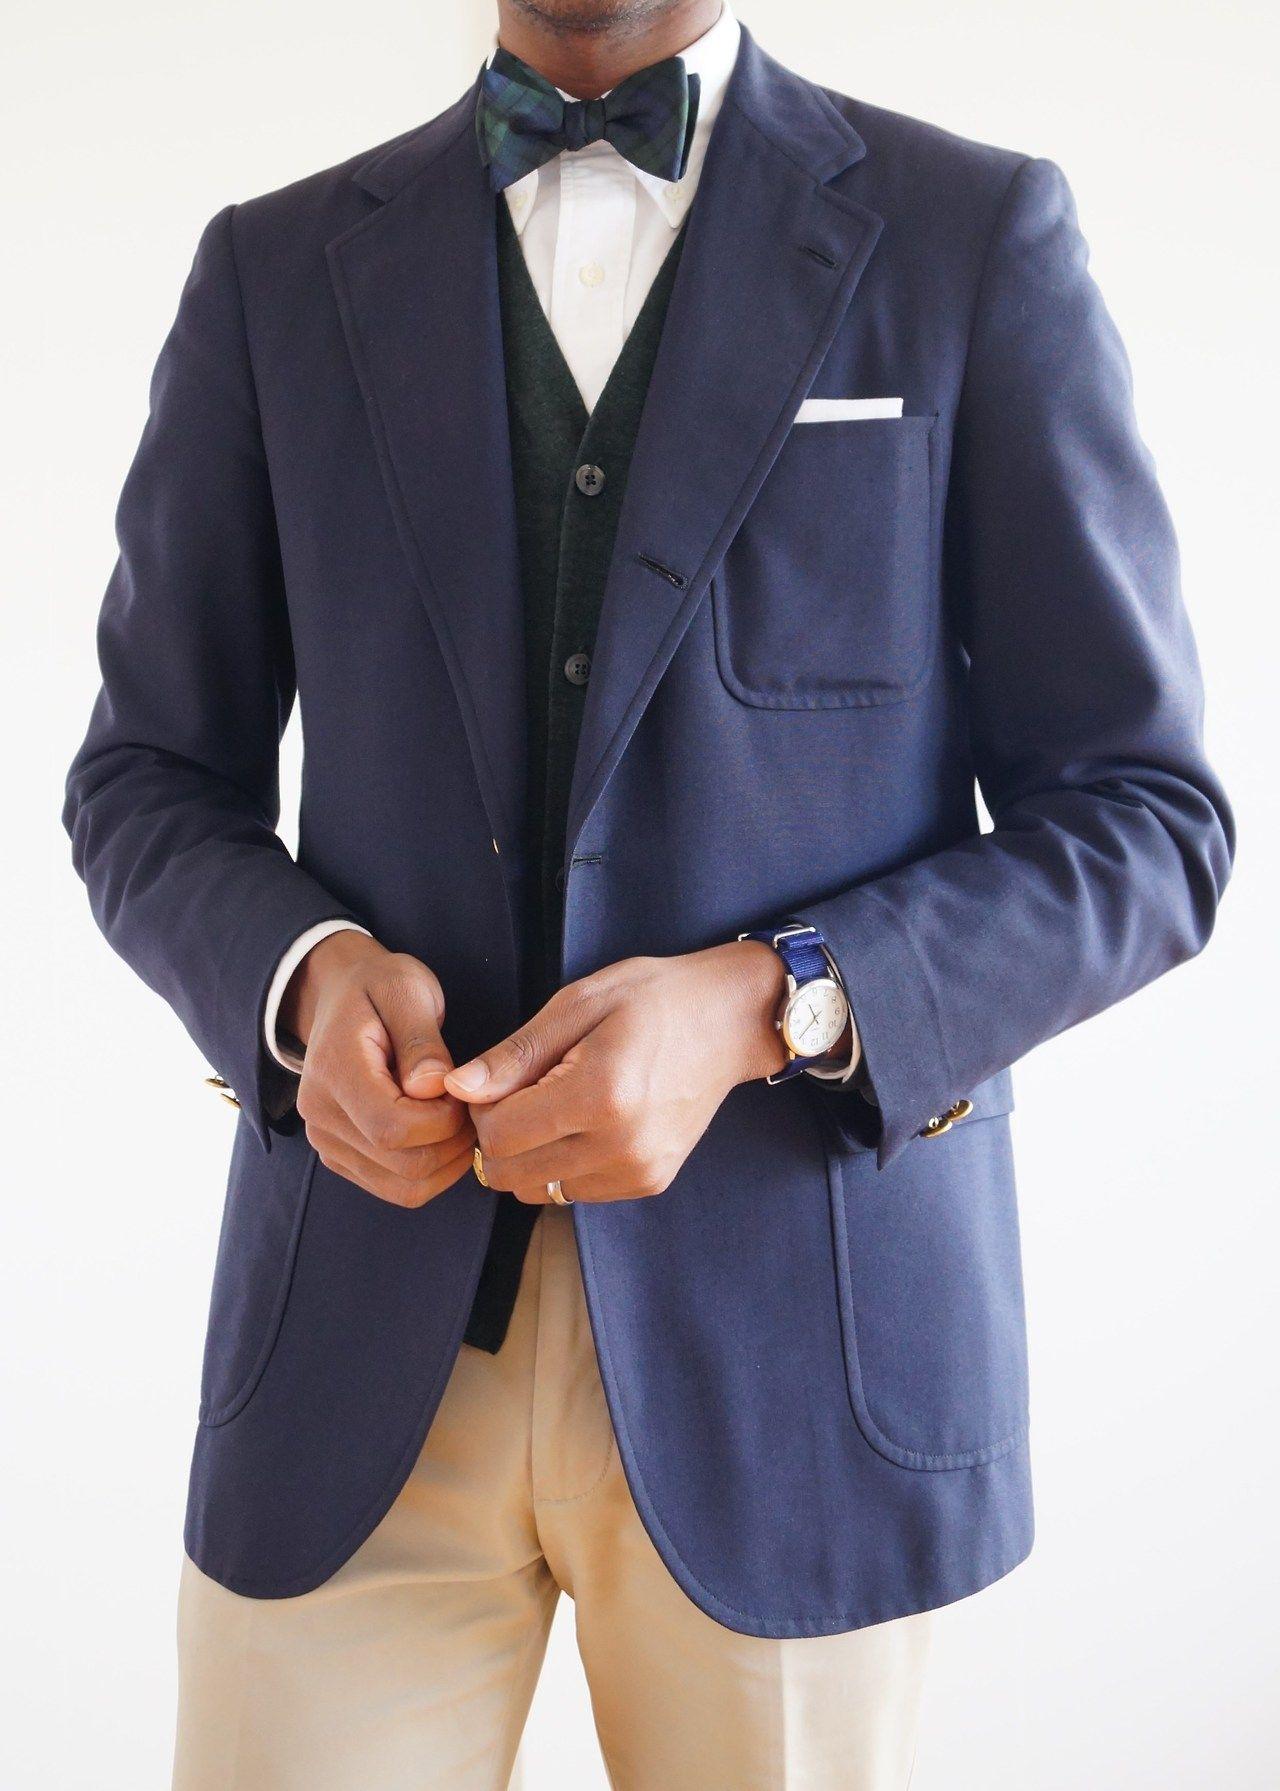 Navy sport coat, white shirt, Black Watch bow tie, khakis